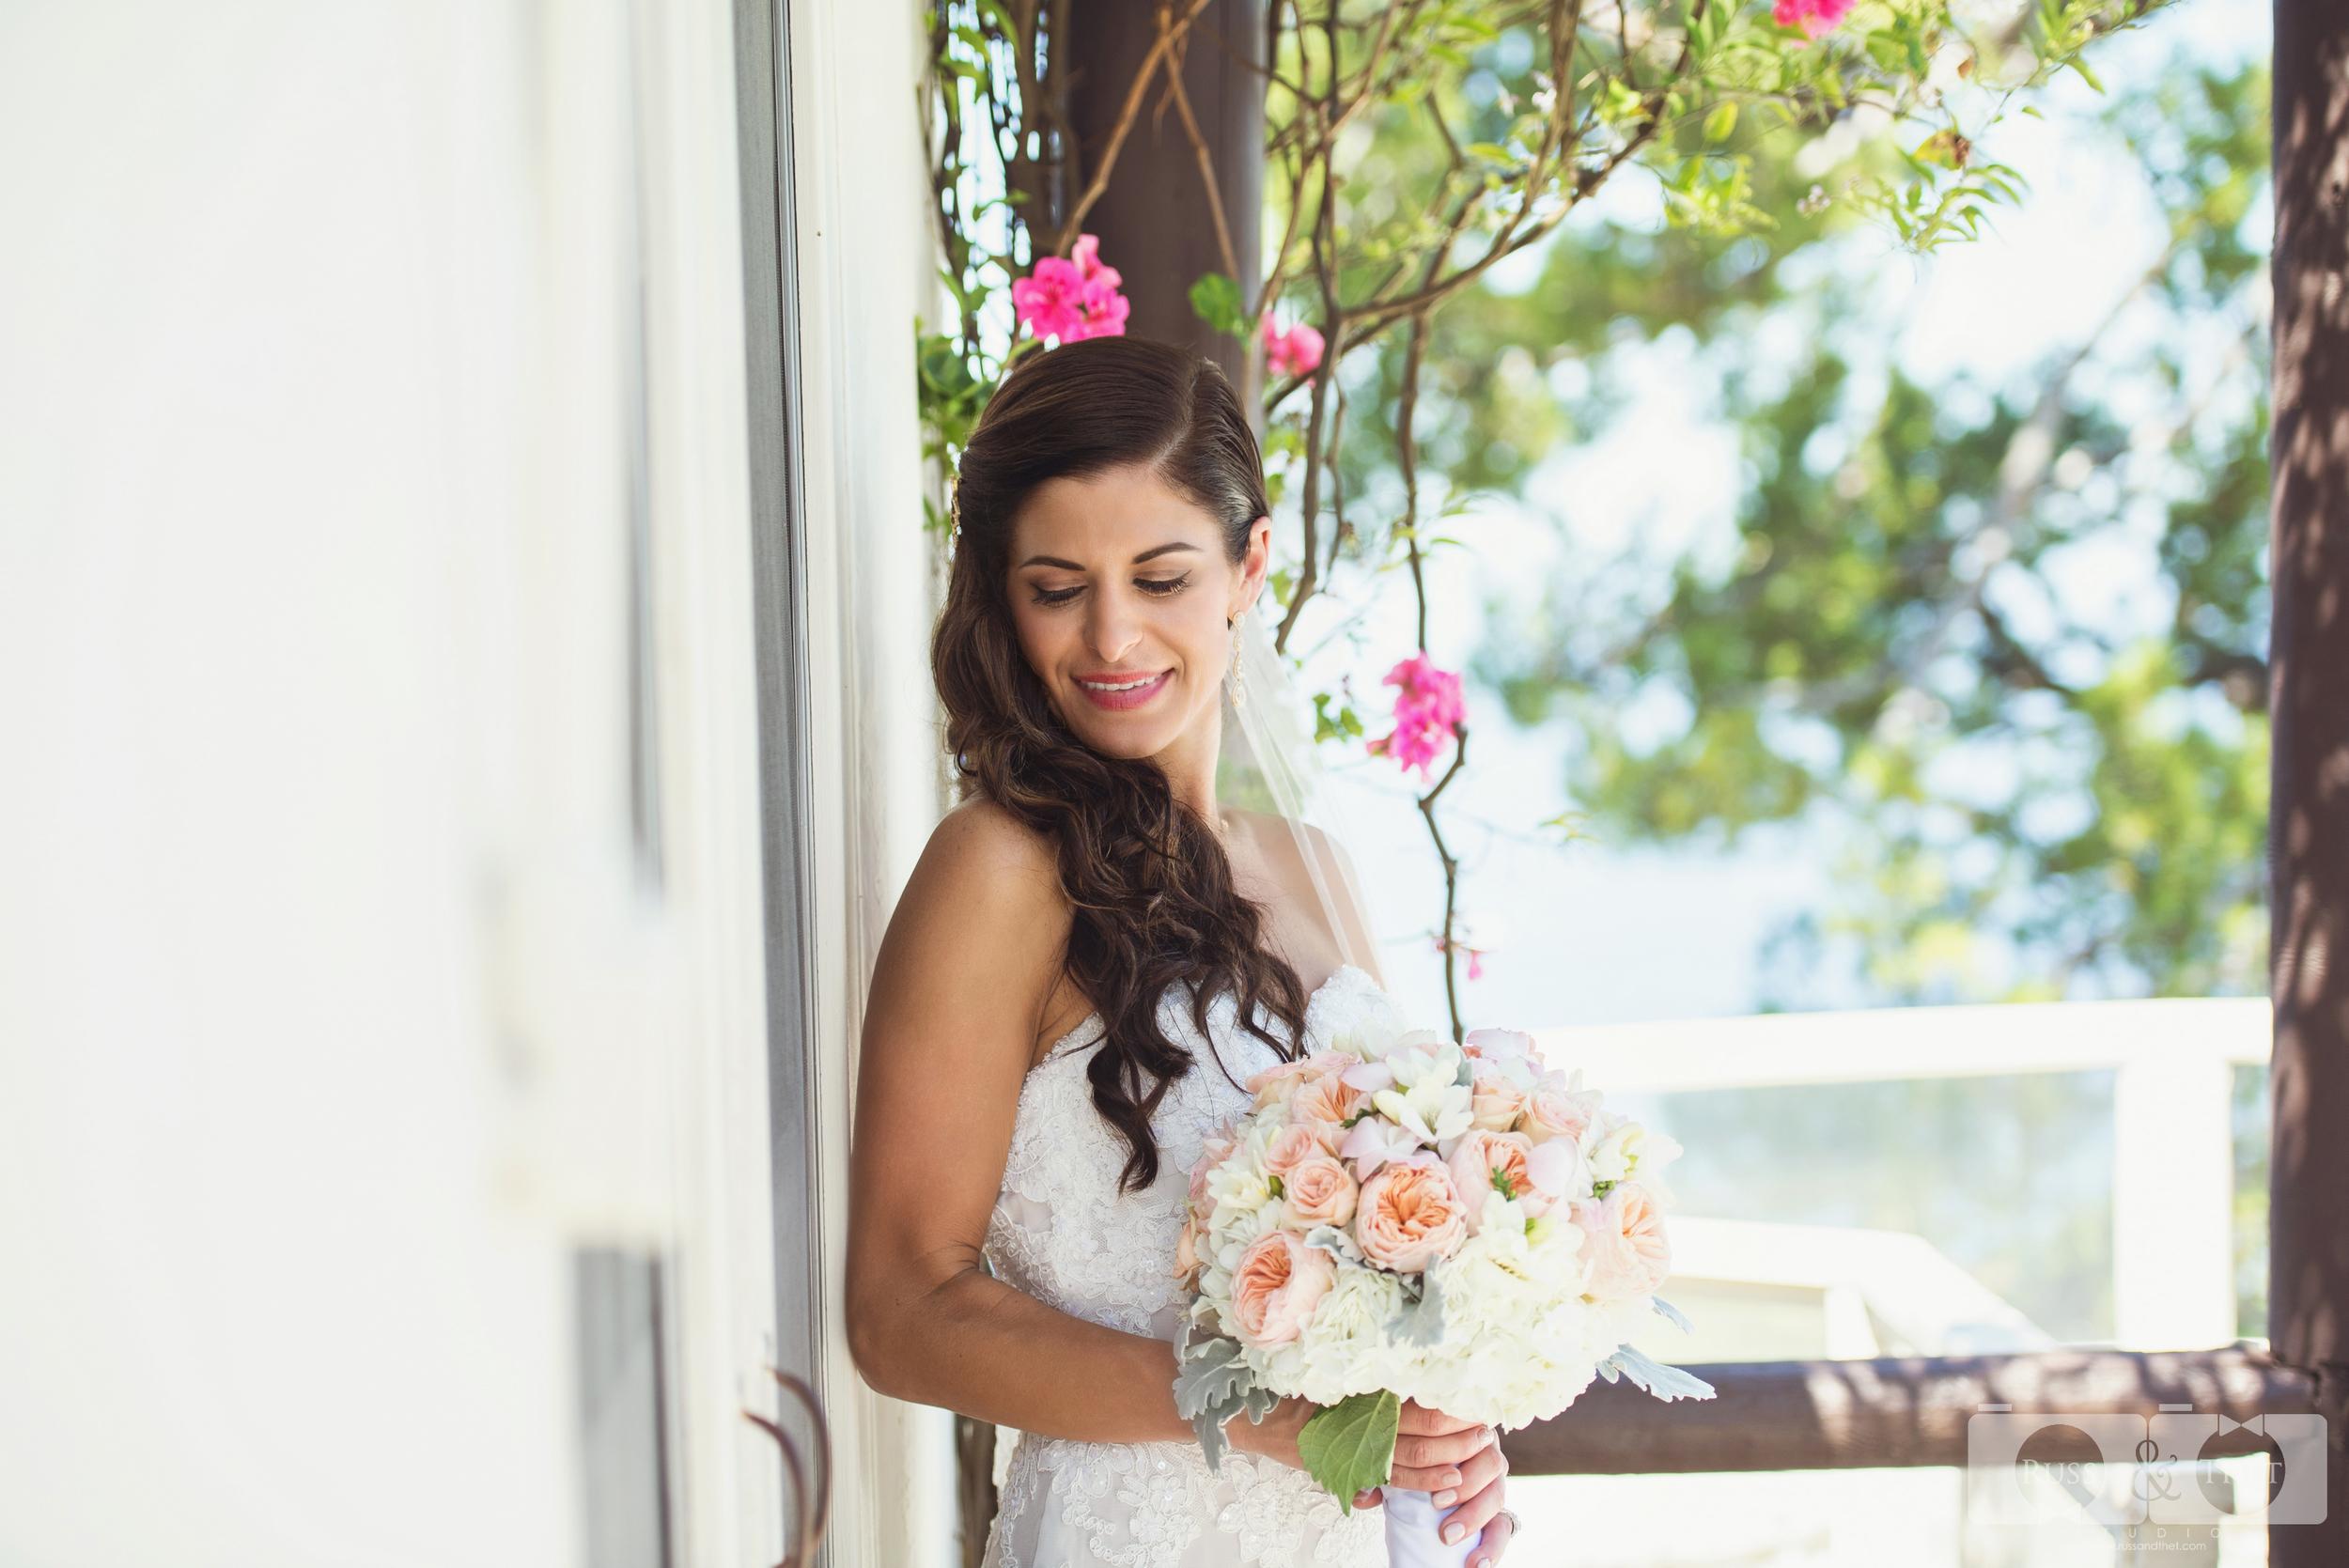 manhattan-beach-wedding-photographer_36.jpg